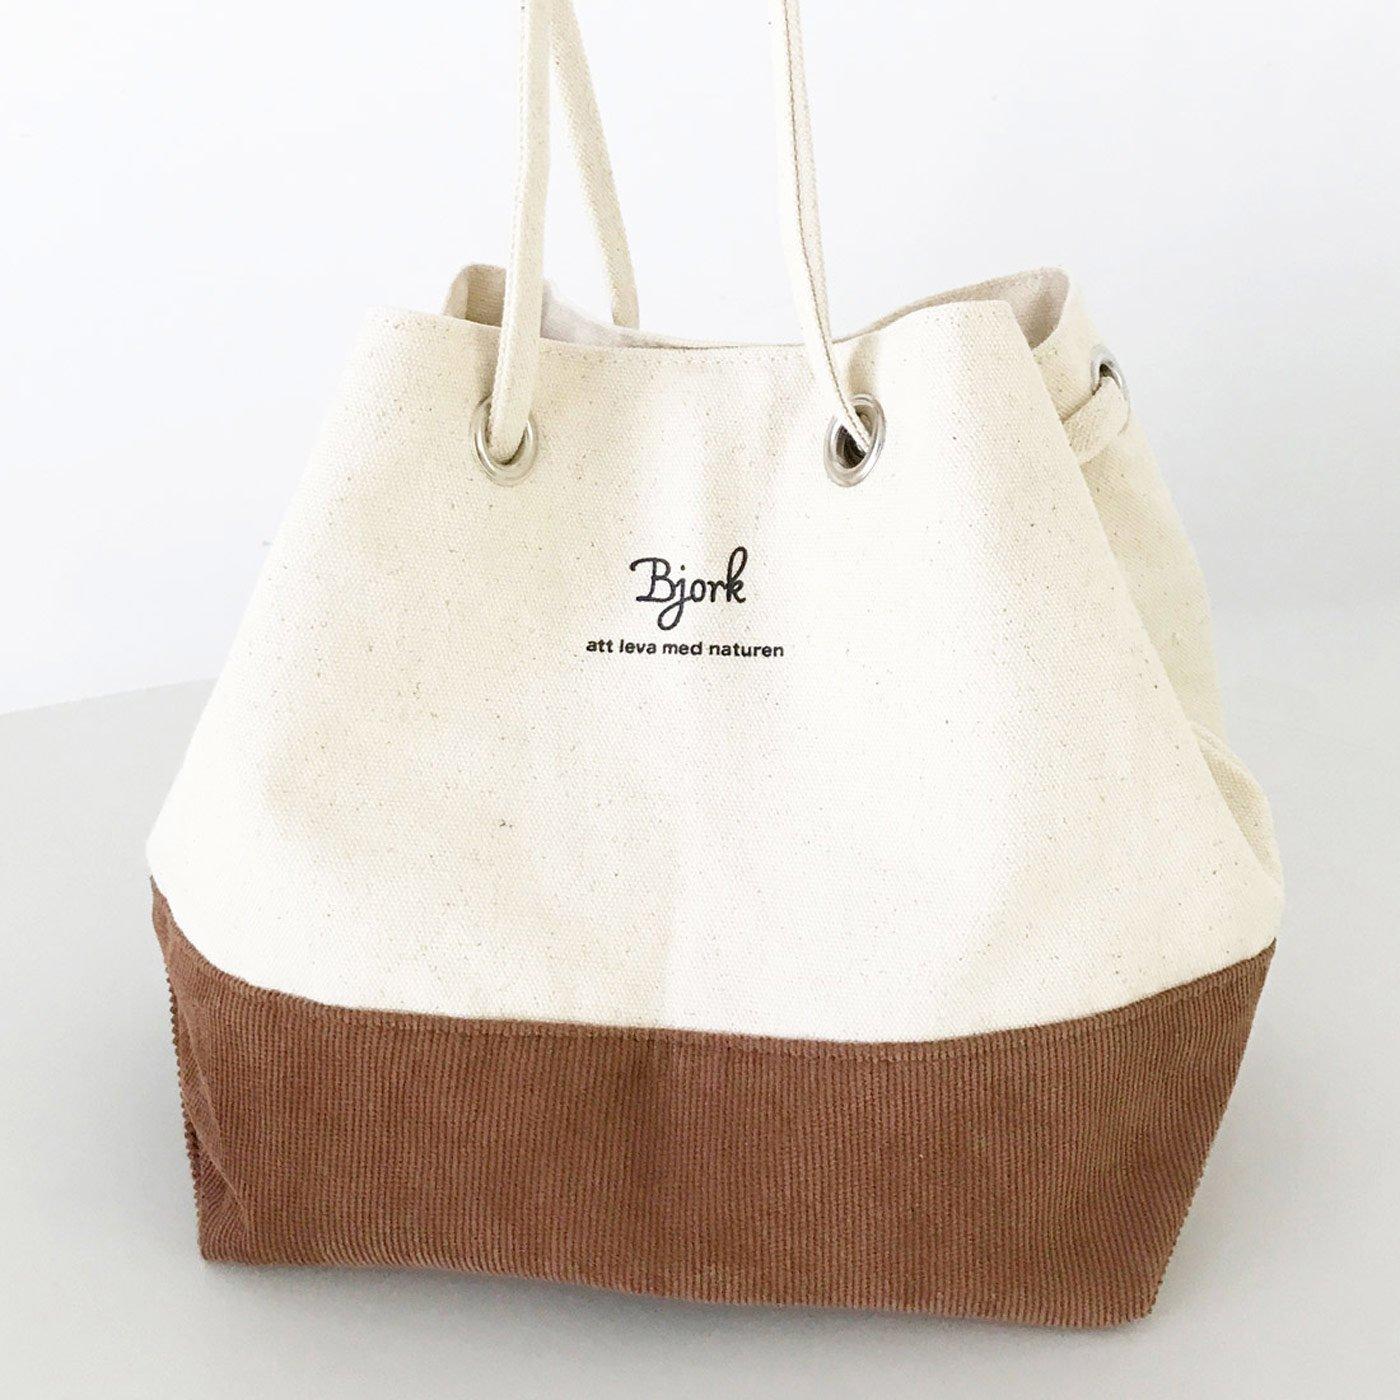 IEDIT[イディット] SELECT 帆布×コーデュロイの巾着バッグ J5252